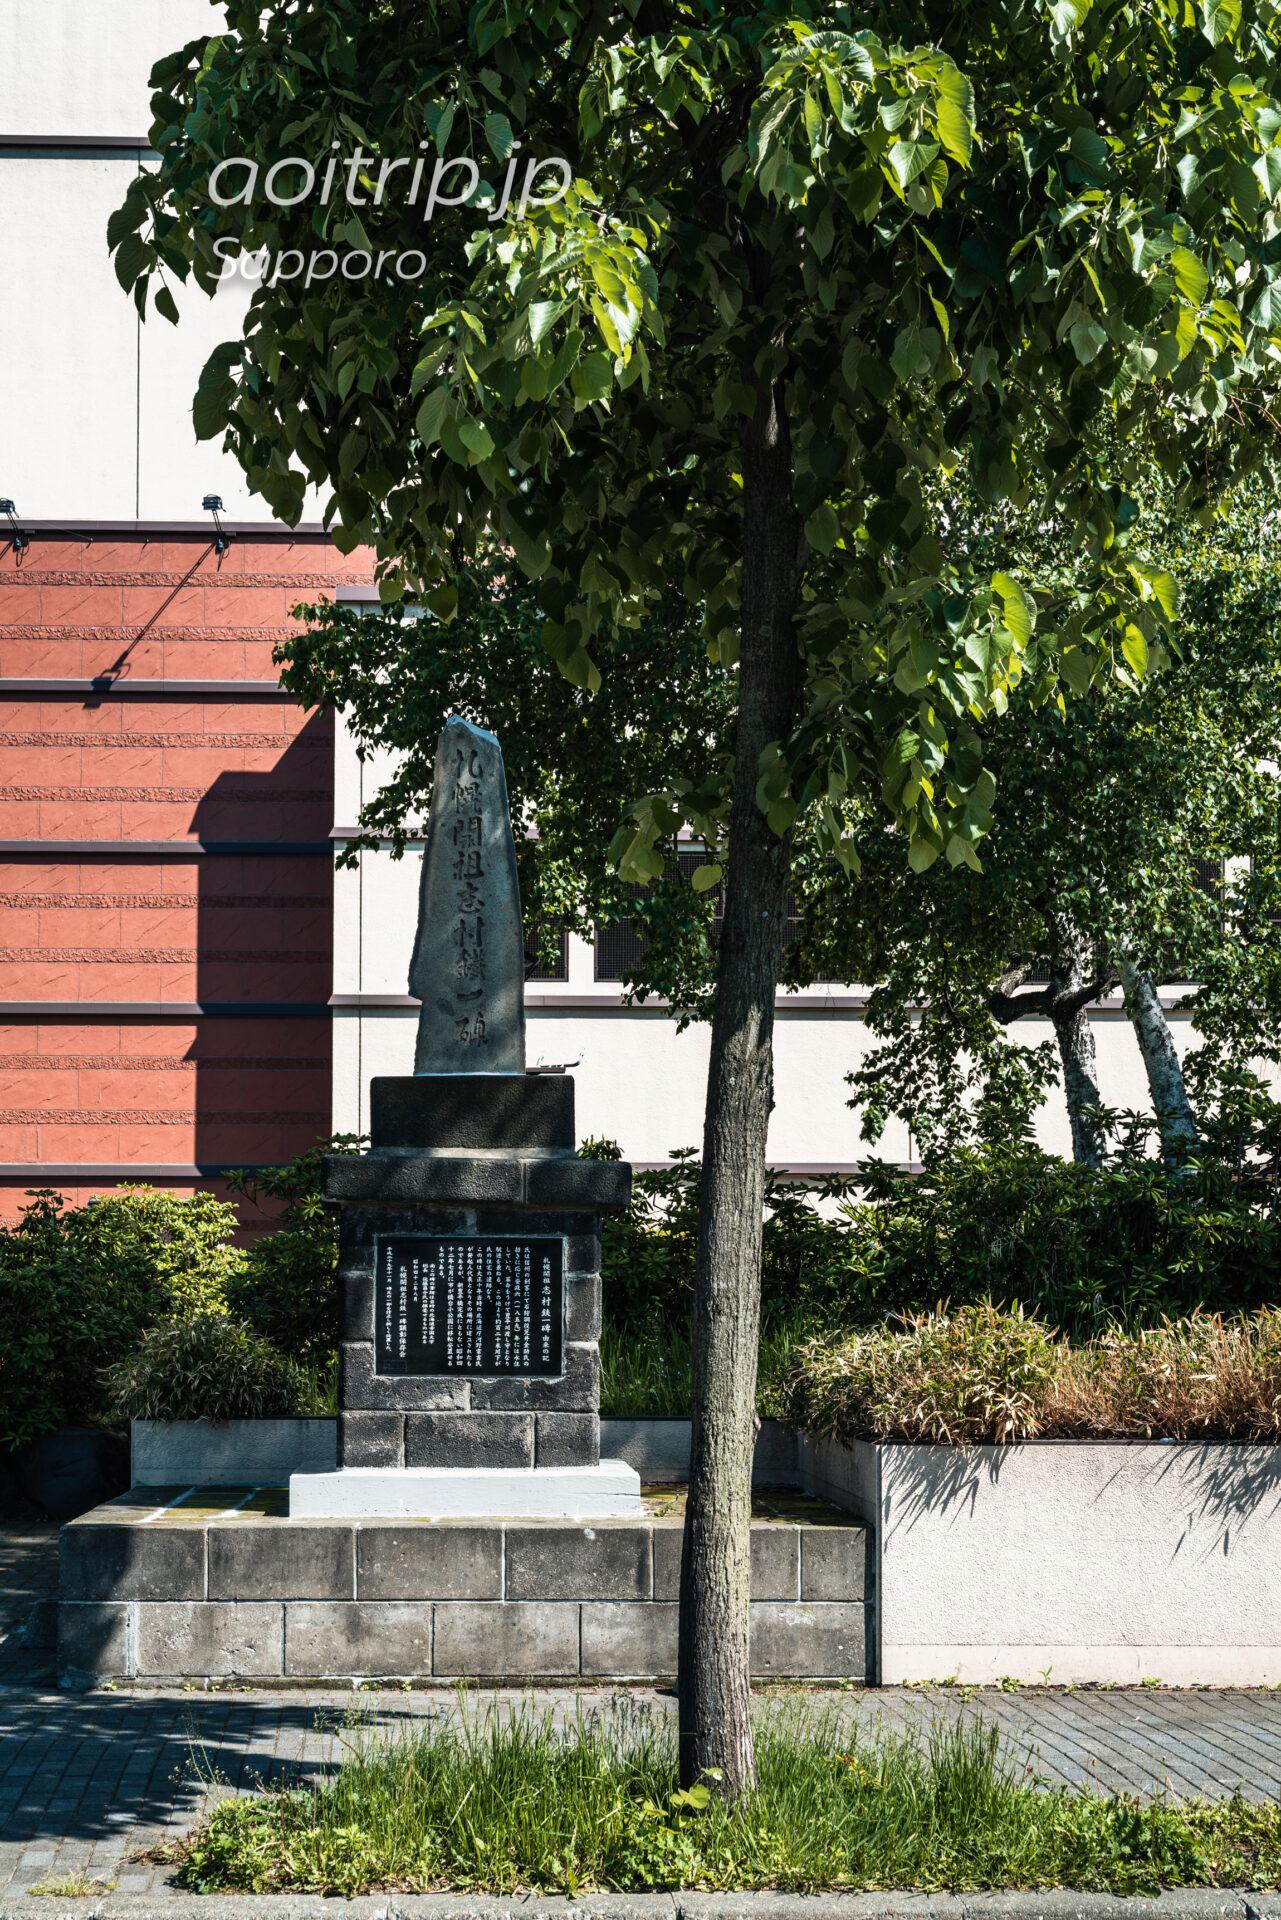 札幌開祖 志村鐡一碑 Tetsuichi Shimura